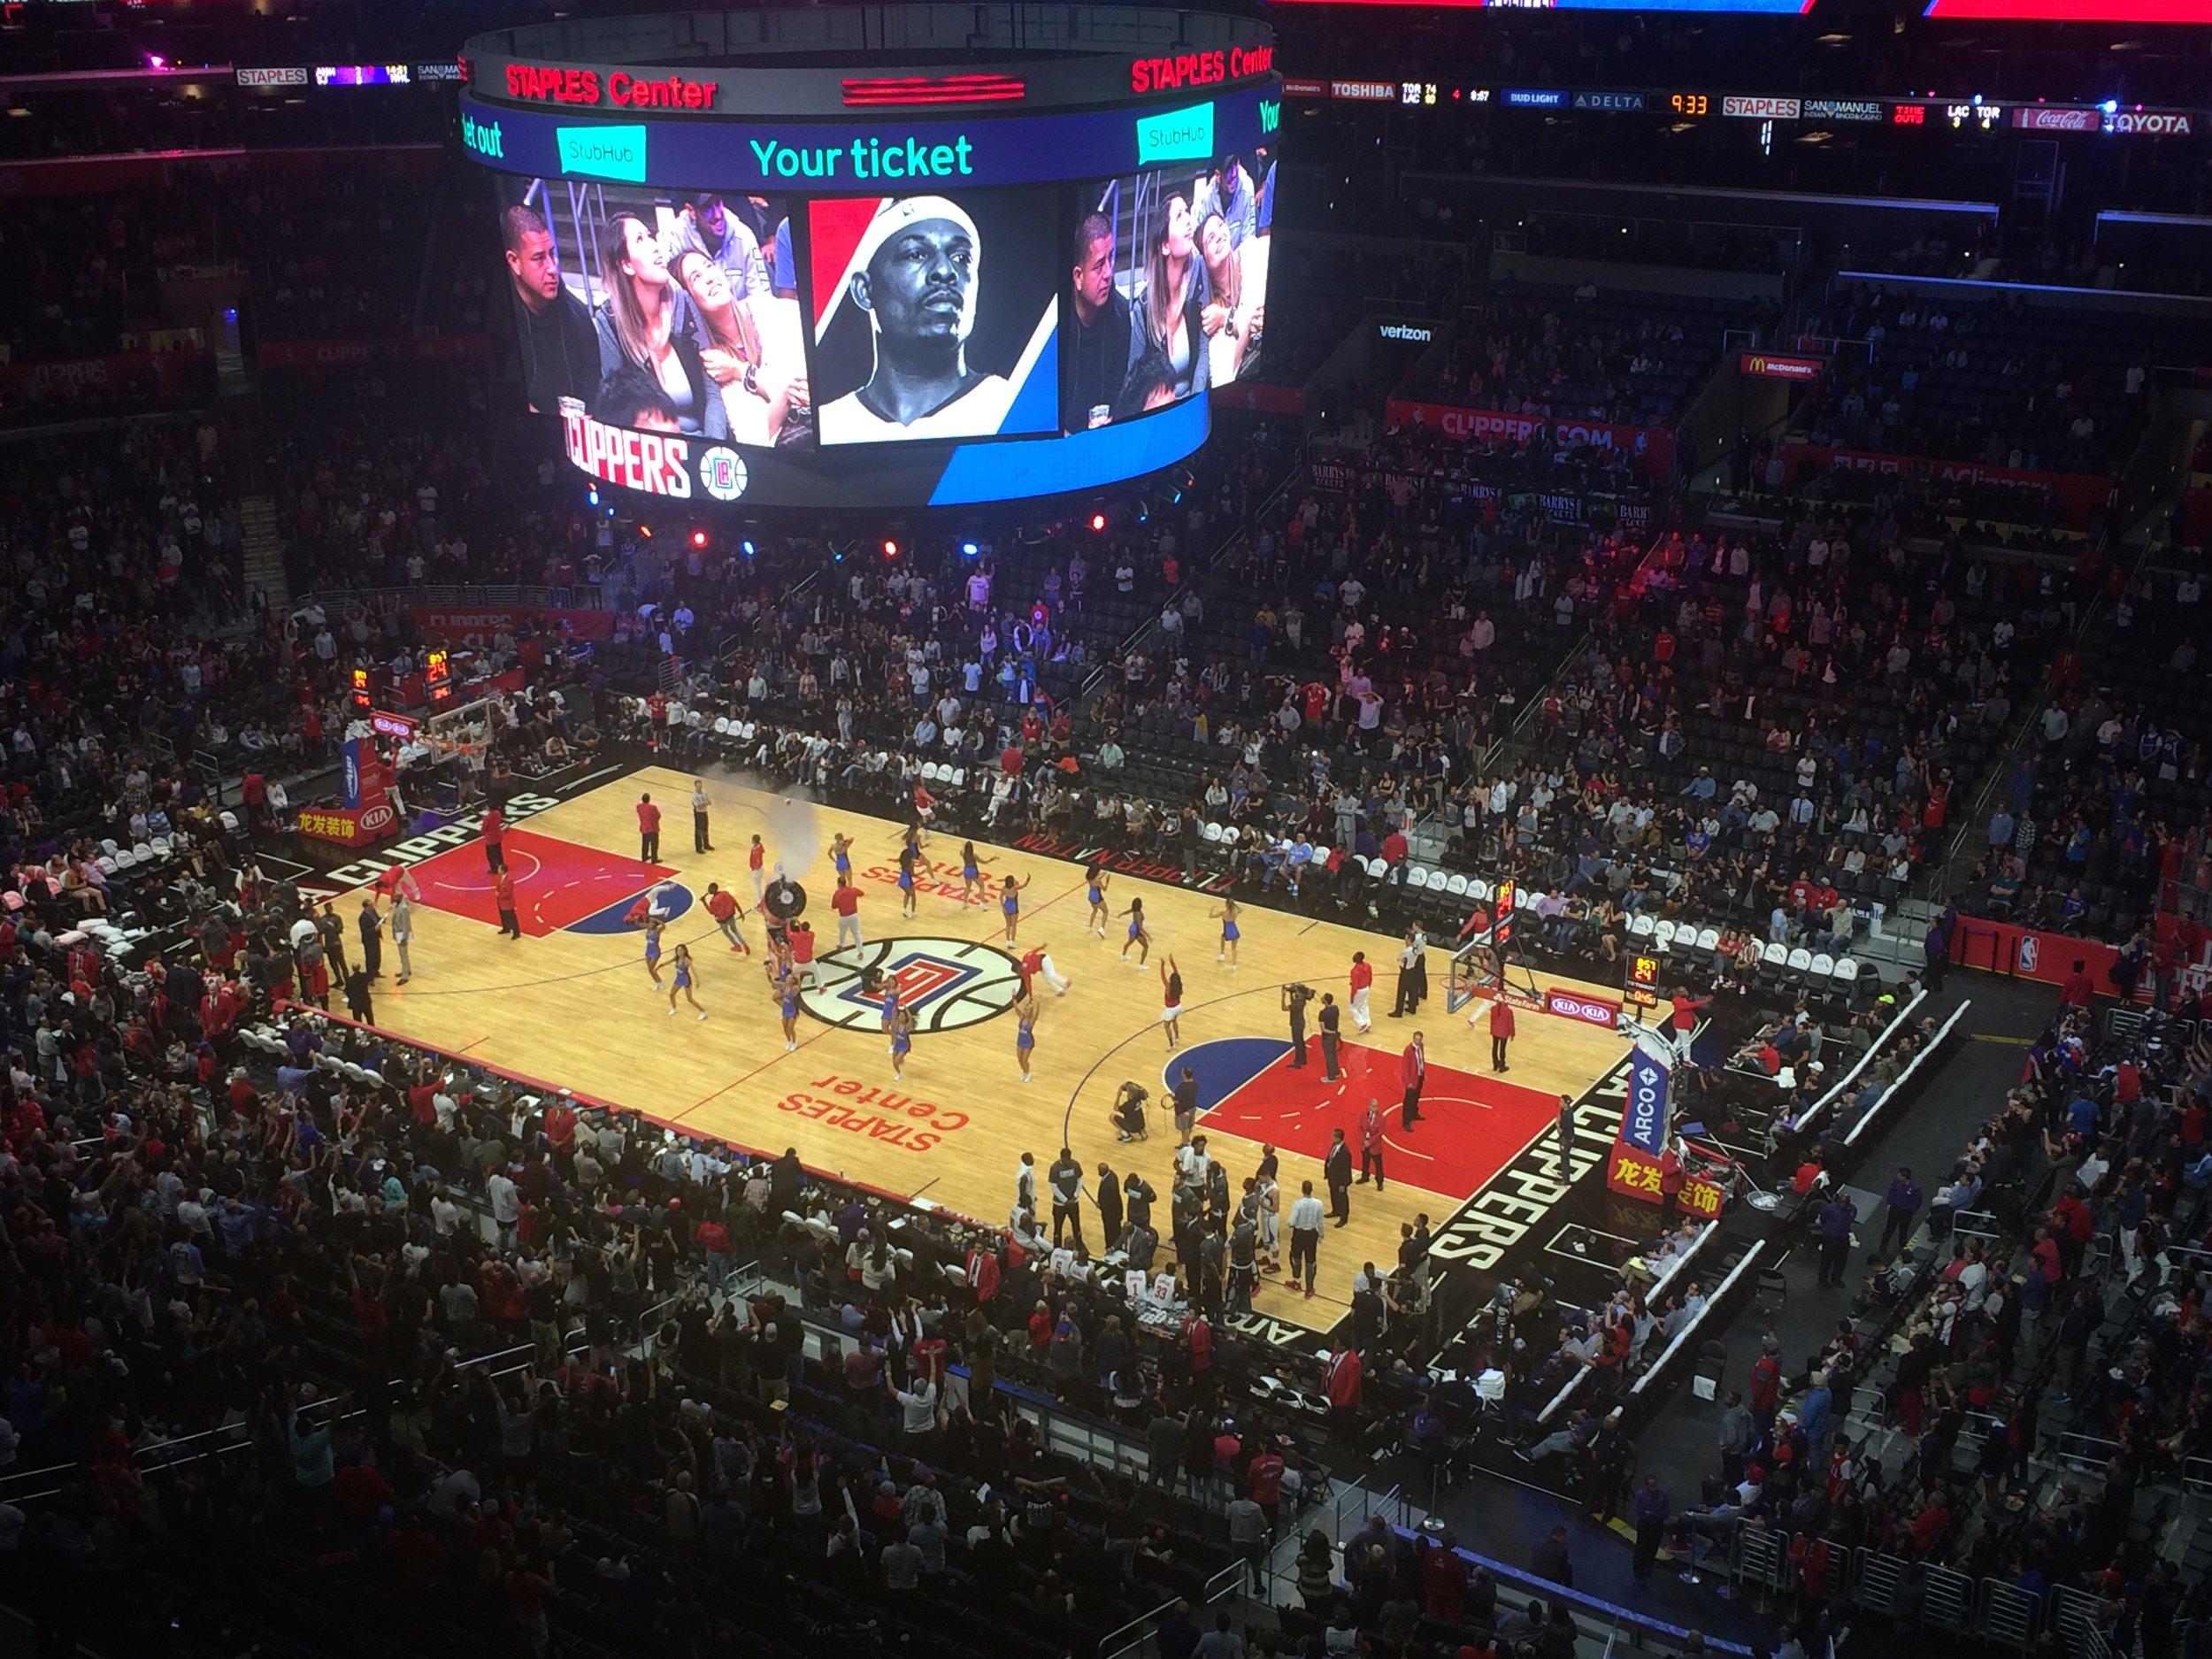 Staples Center (Clippers vs. Raptors)